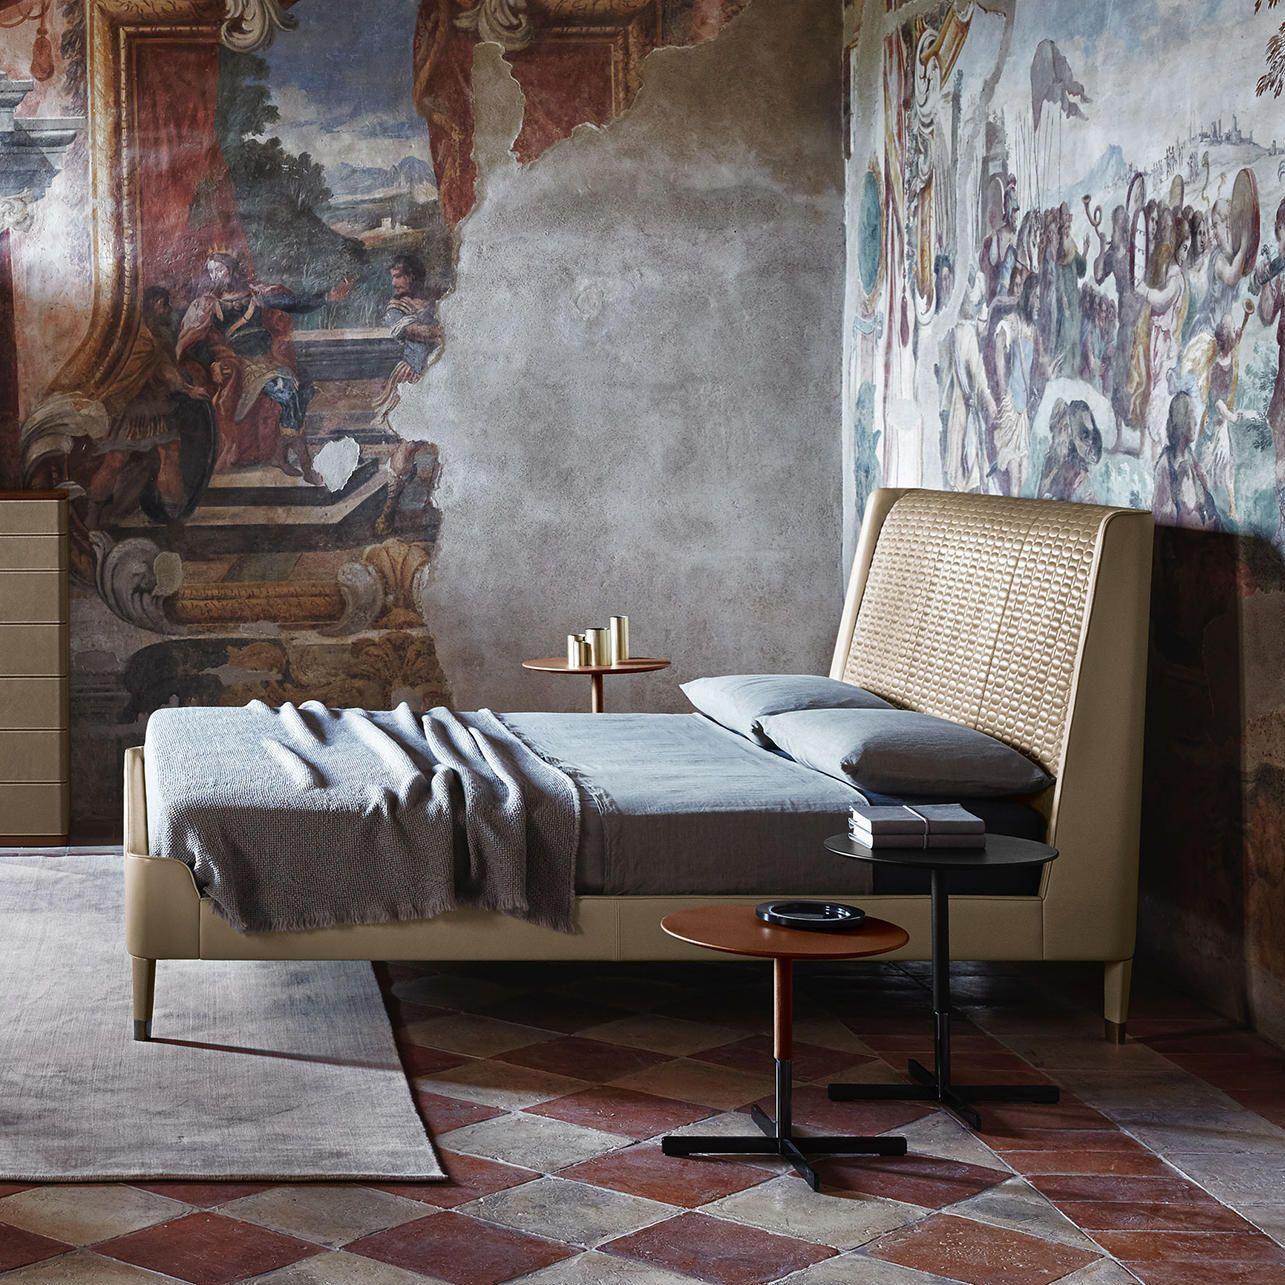 Poltrona Frau Suzie Wong bed | Bedroom in 2018 | Pinterest